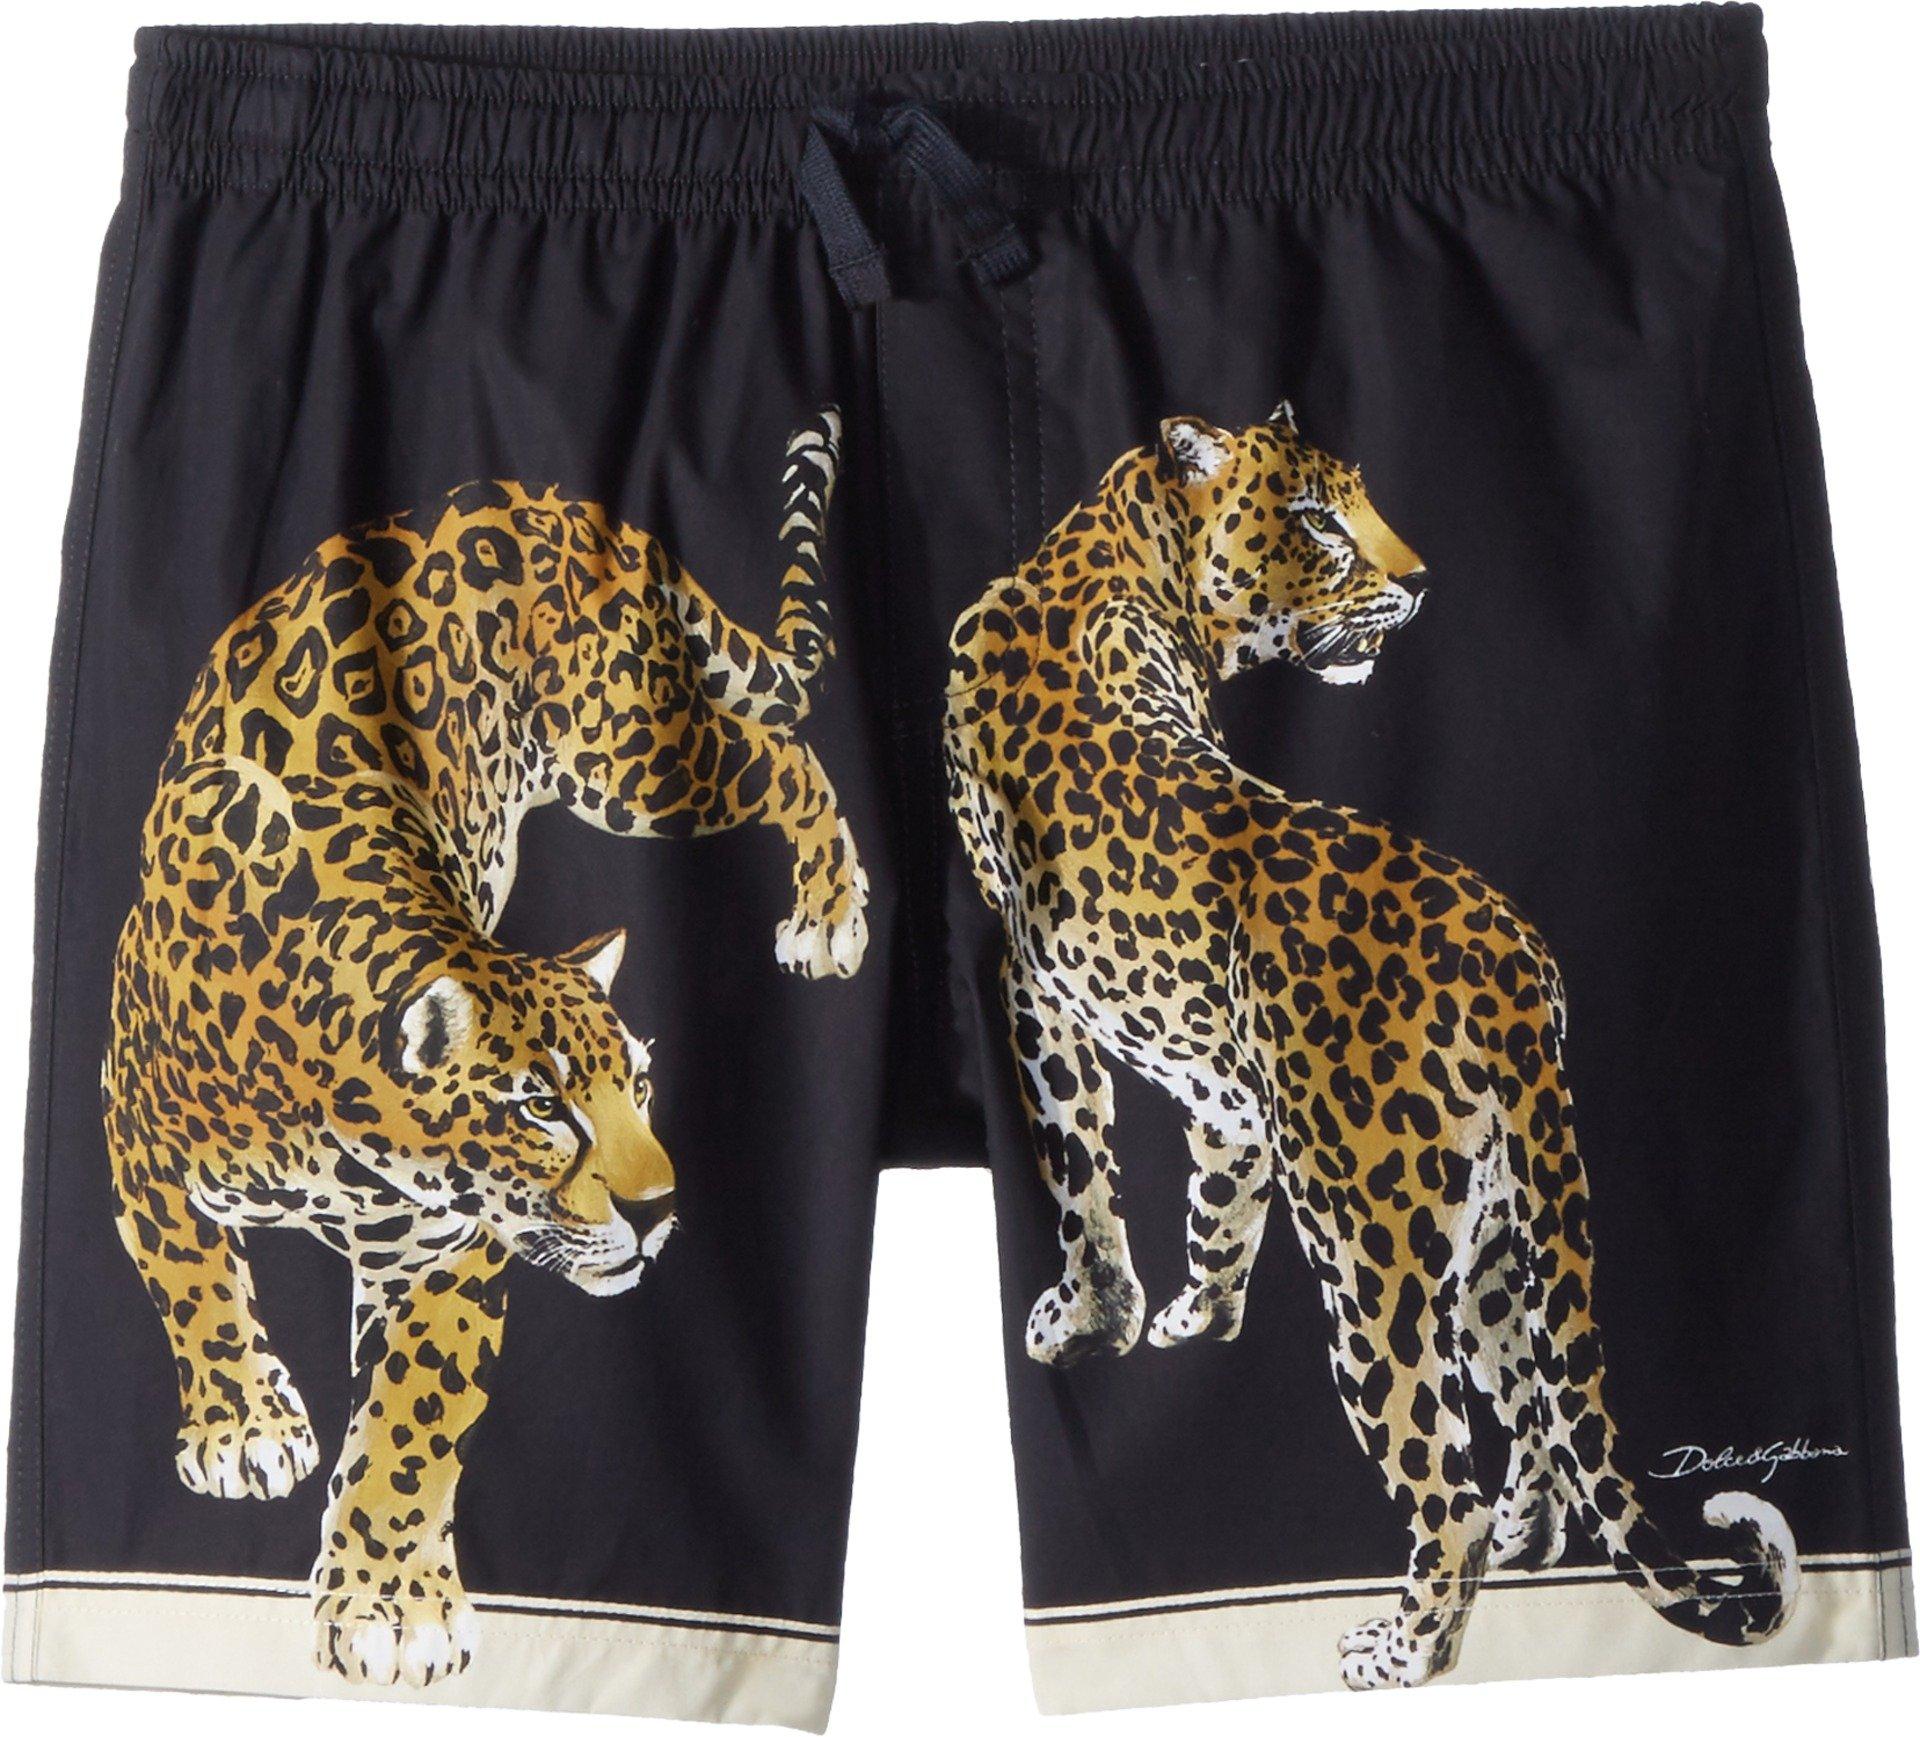 Dolce & Gabbana Kids Boy's Shorts (Big Kids) Black Leopard Print 8